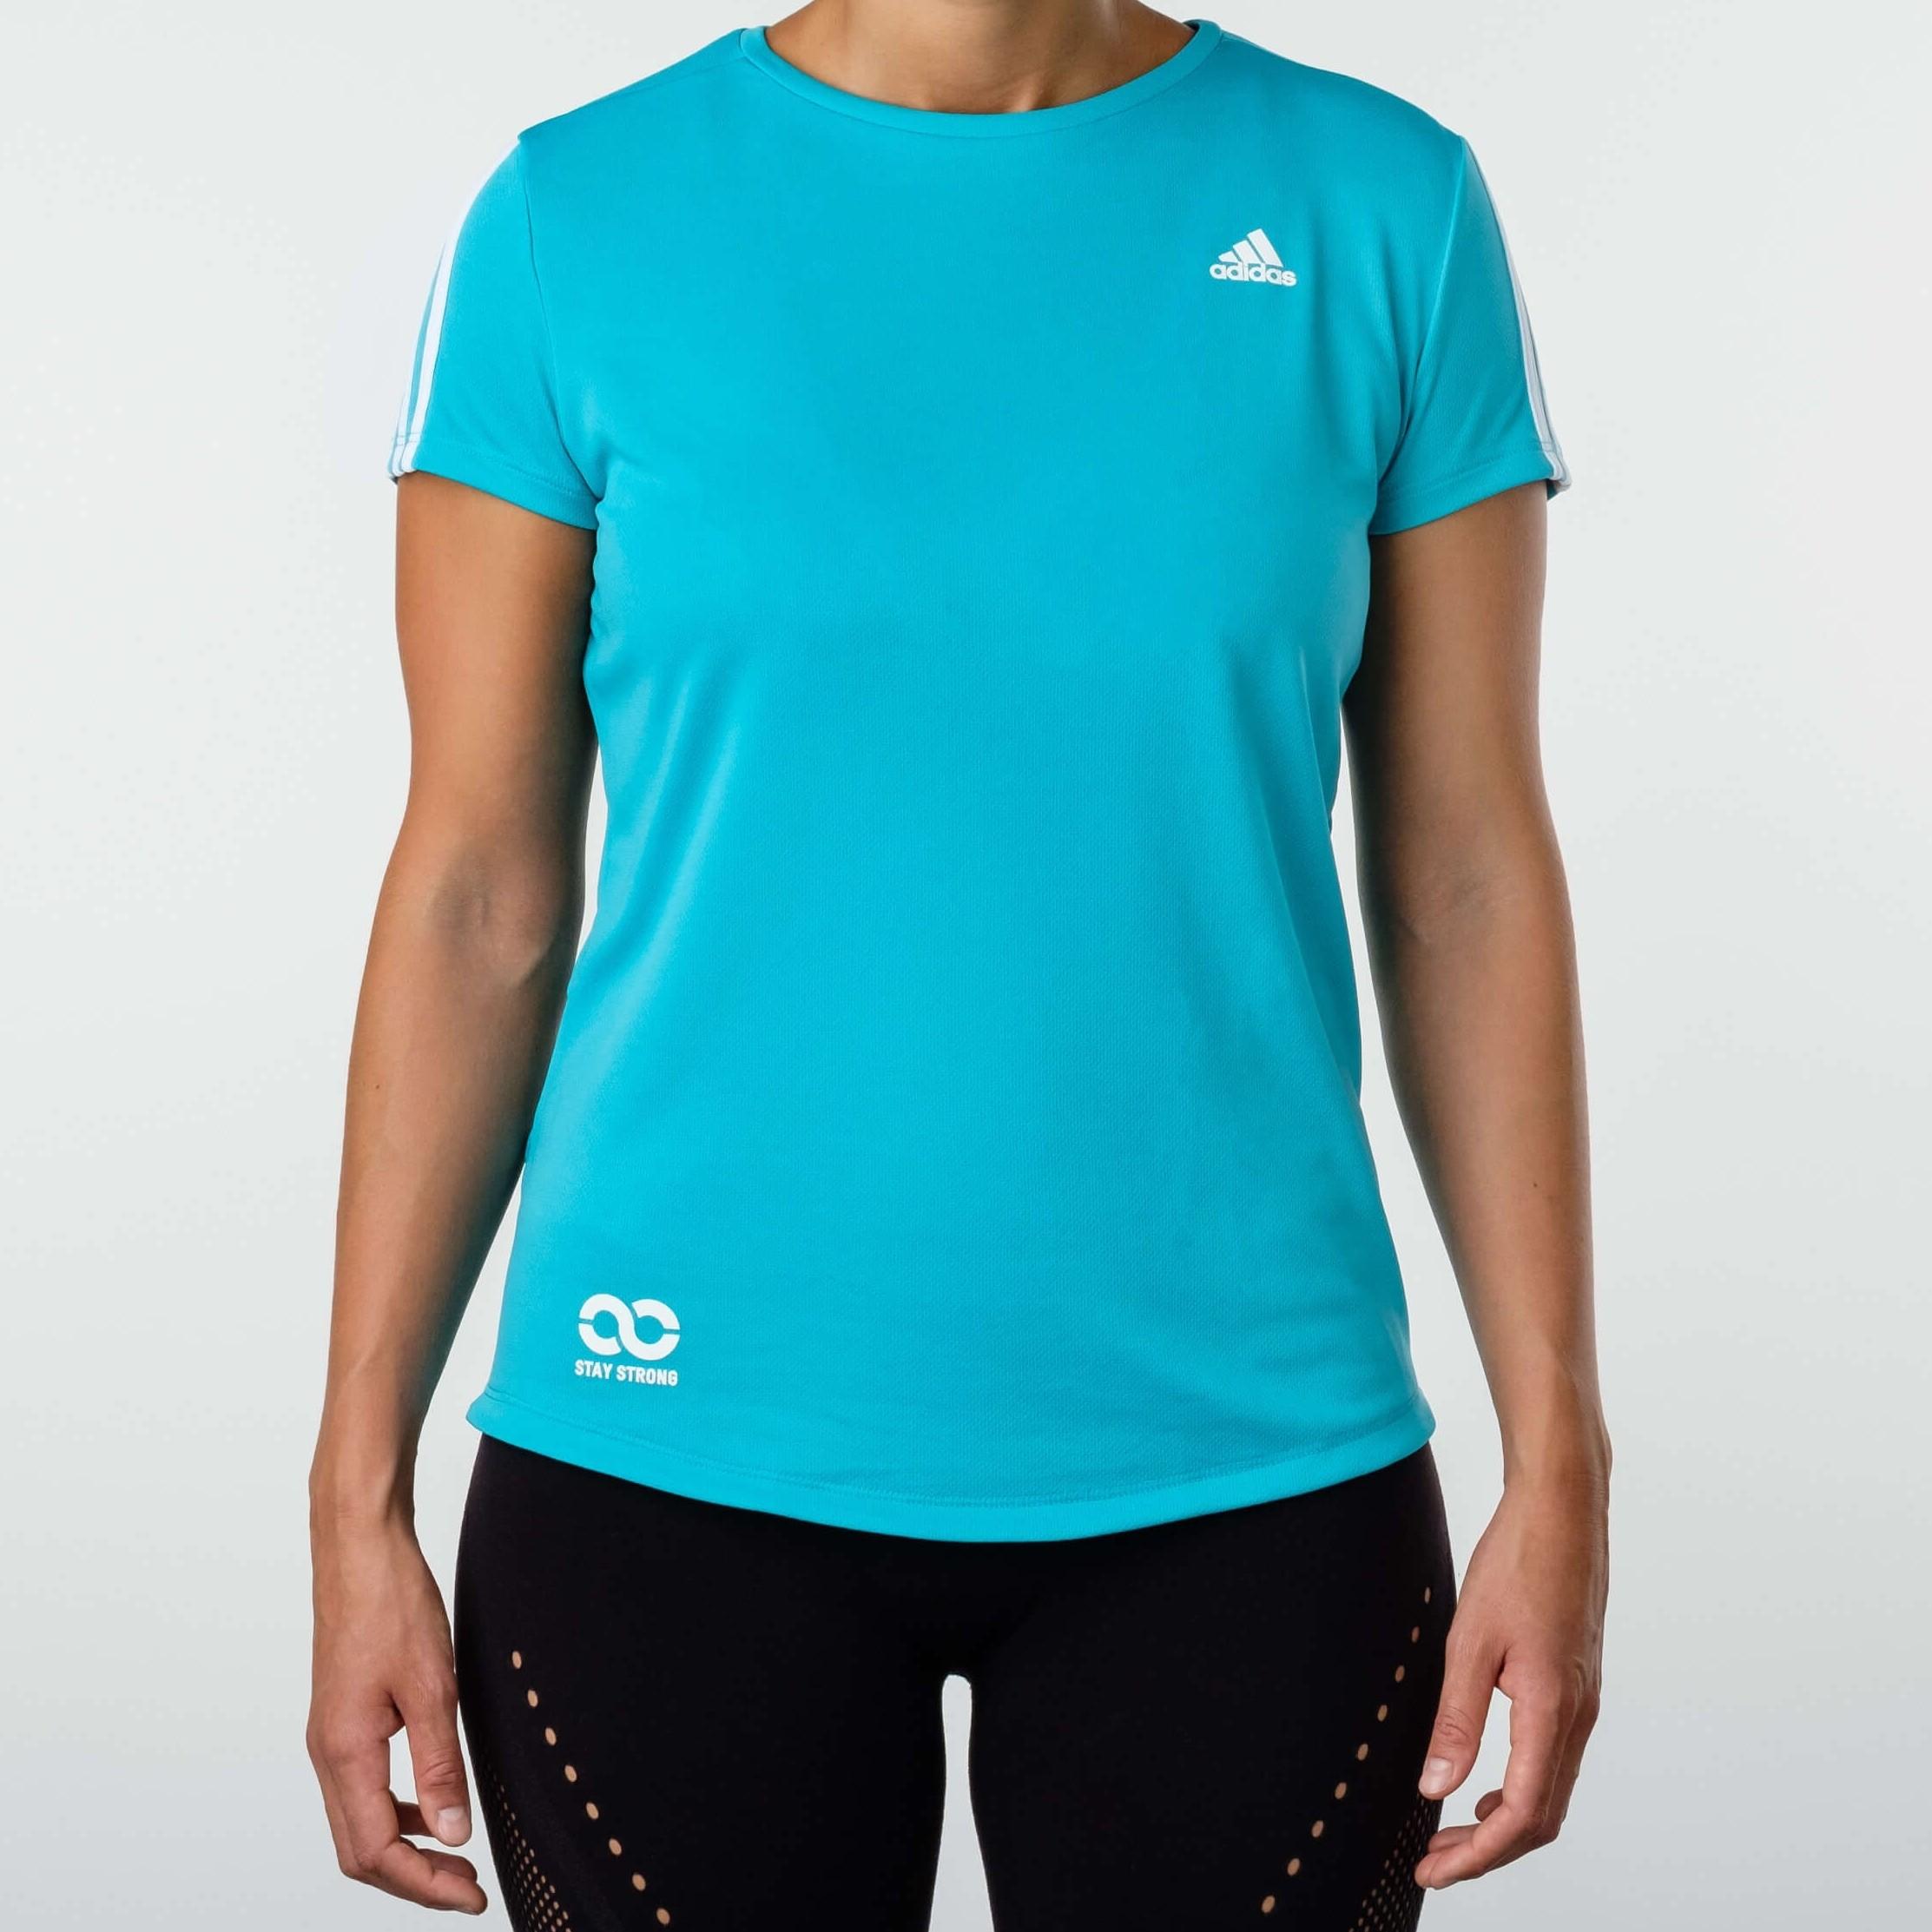 Adidas Original Bootcamp Shirt (Frauen)